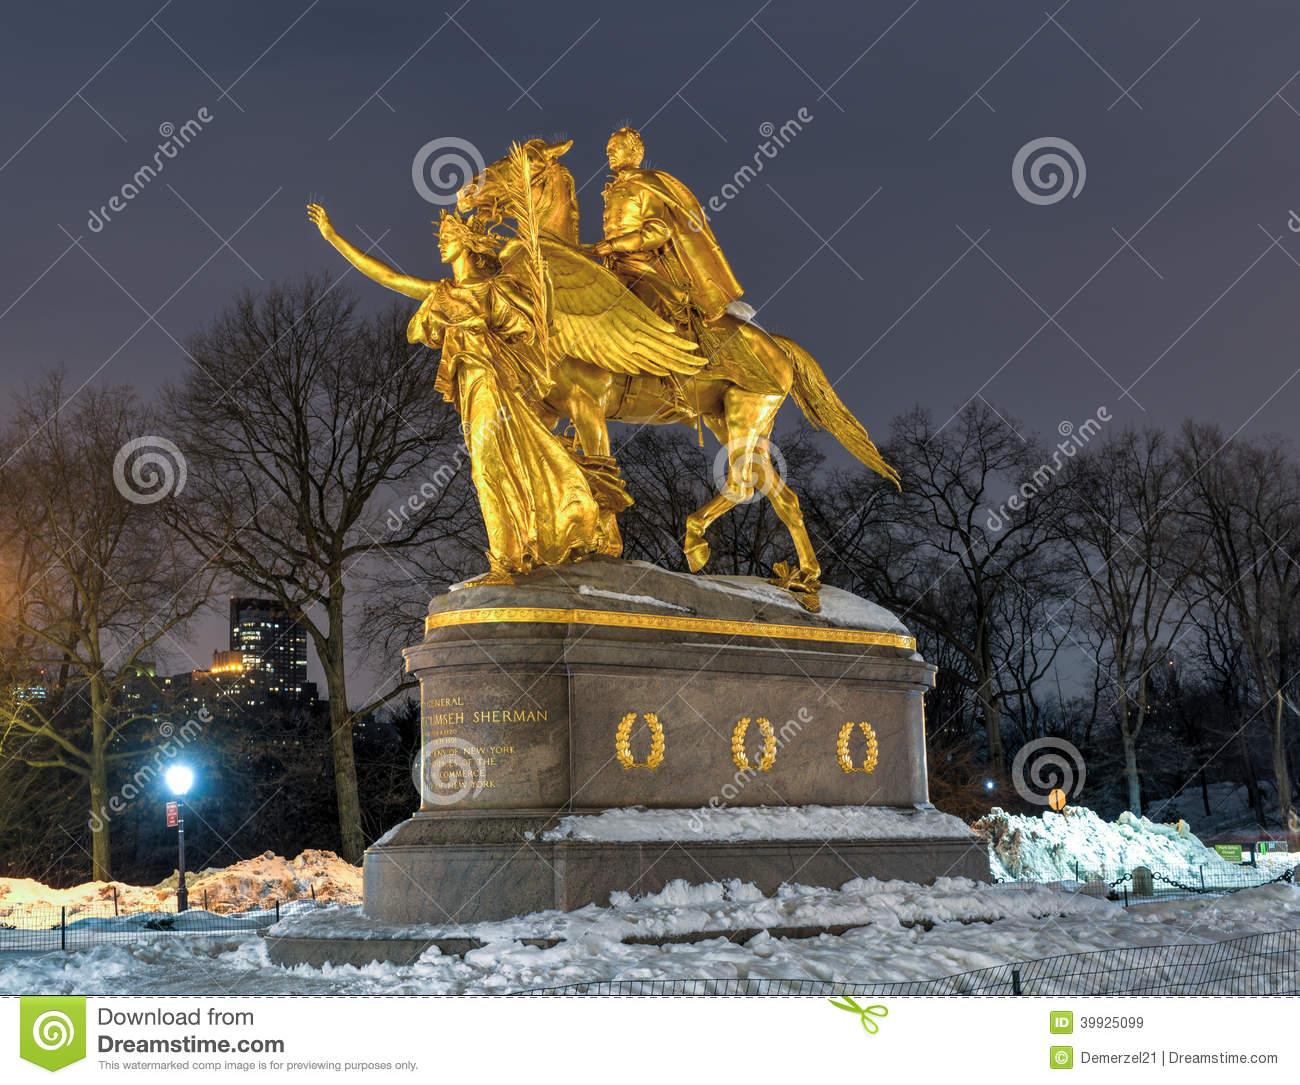 William Sherman Memorial Located In New York City On The Corner Of.